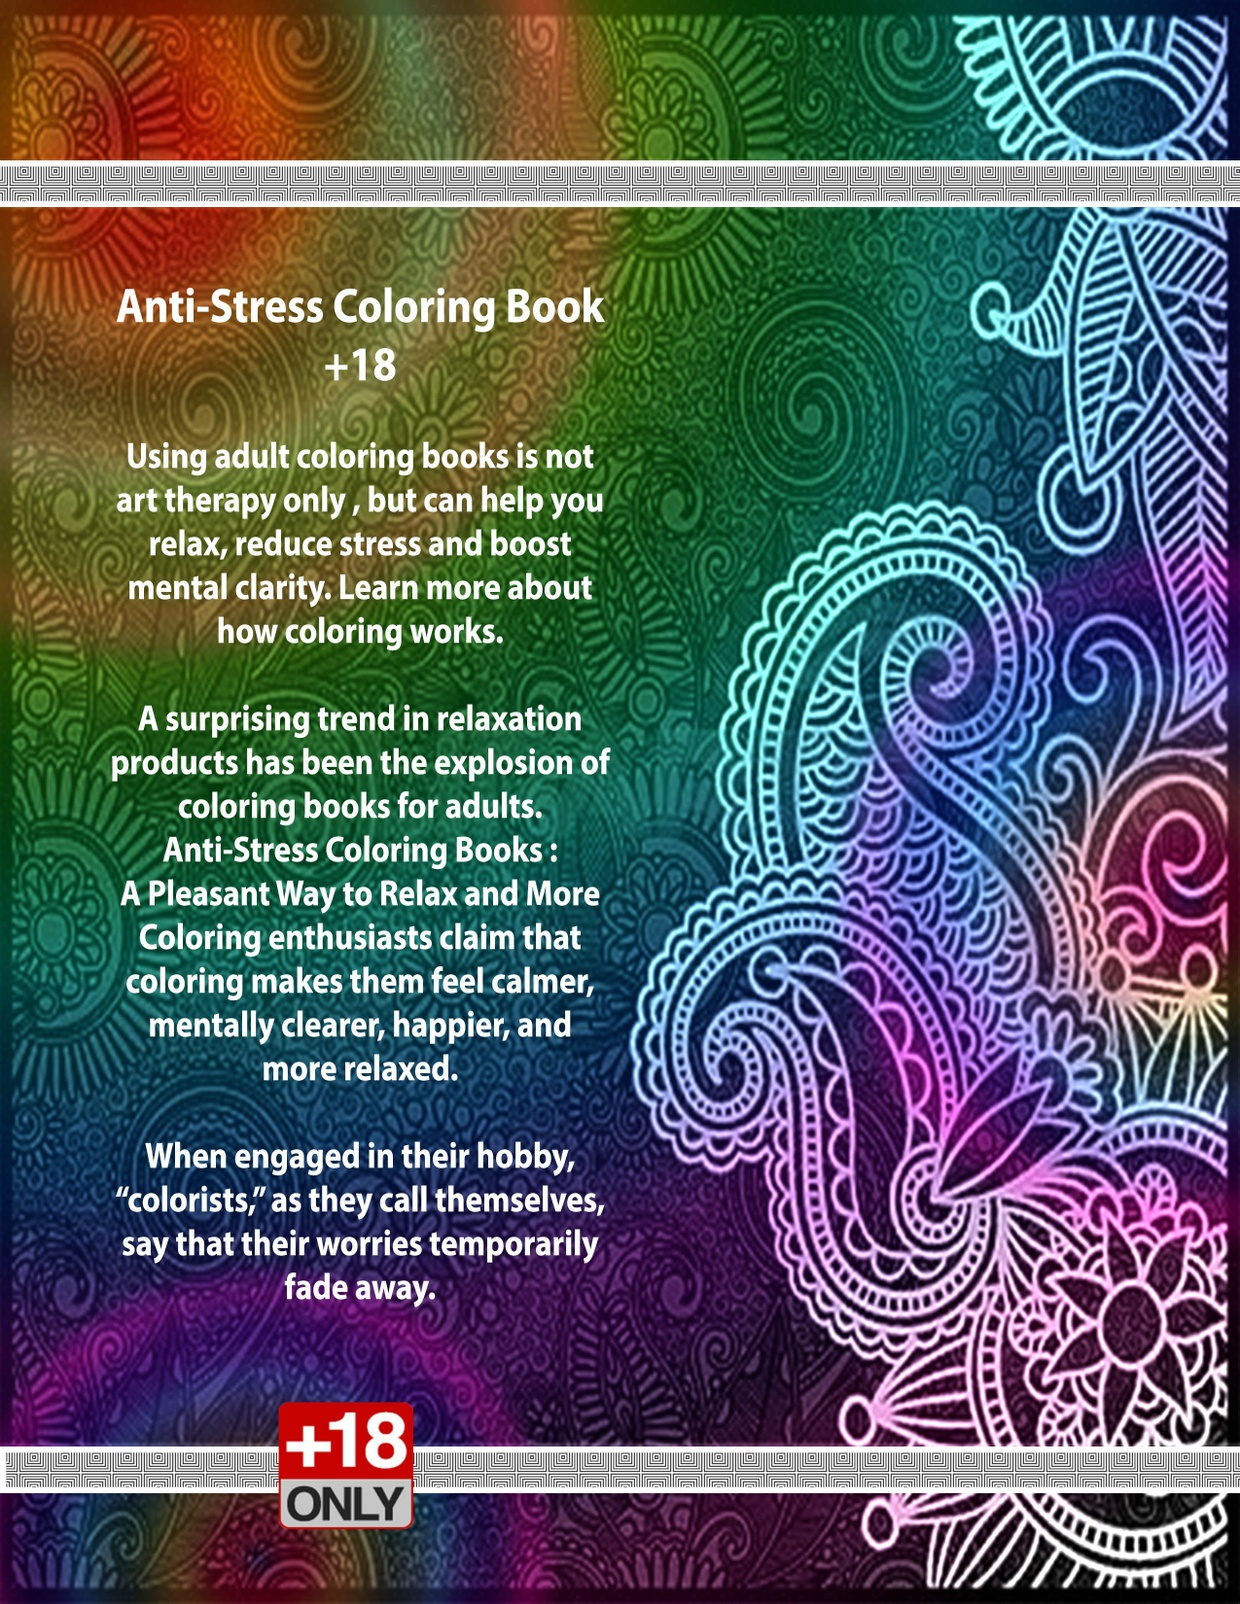 Stress coloring books -  Anti Stress Coloring Book 18